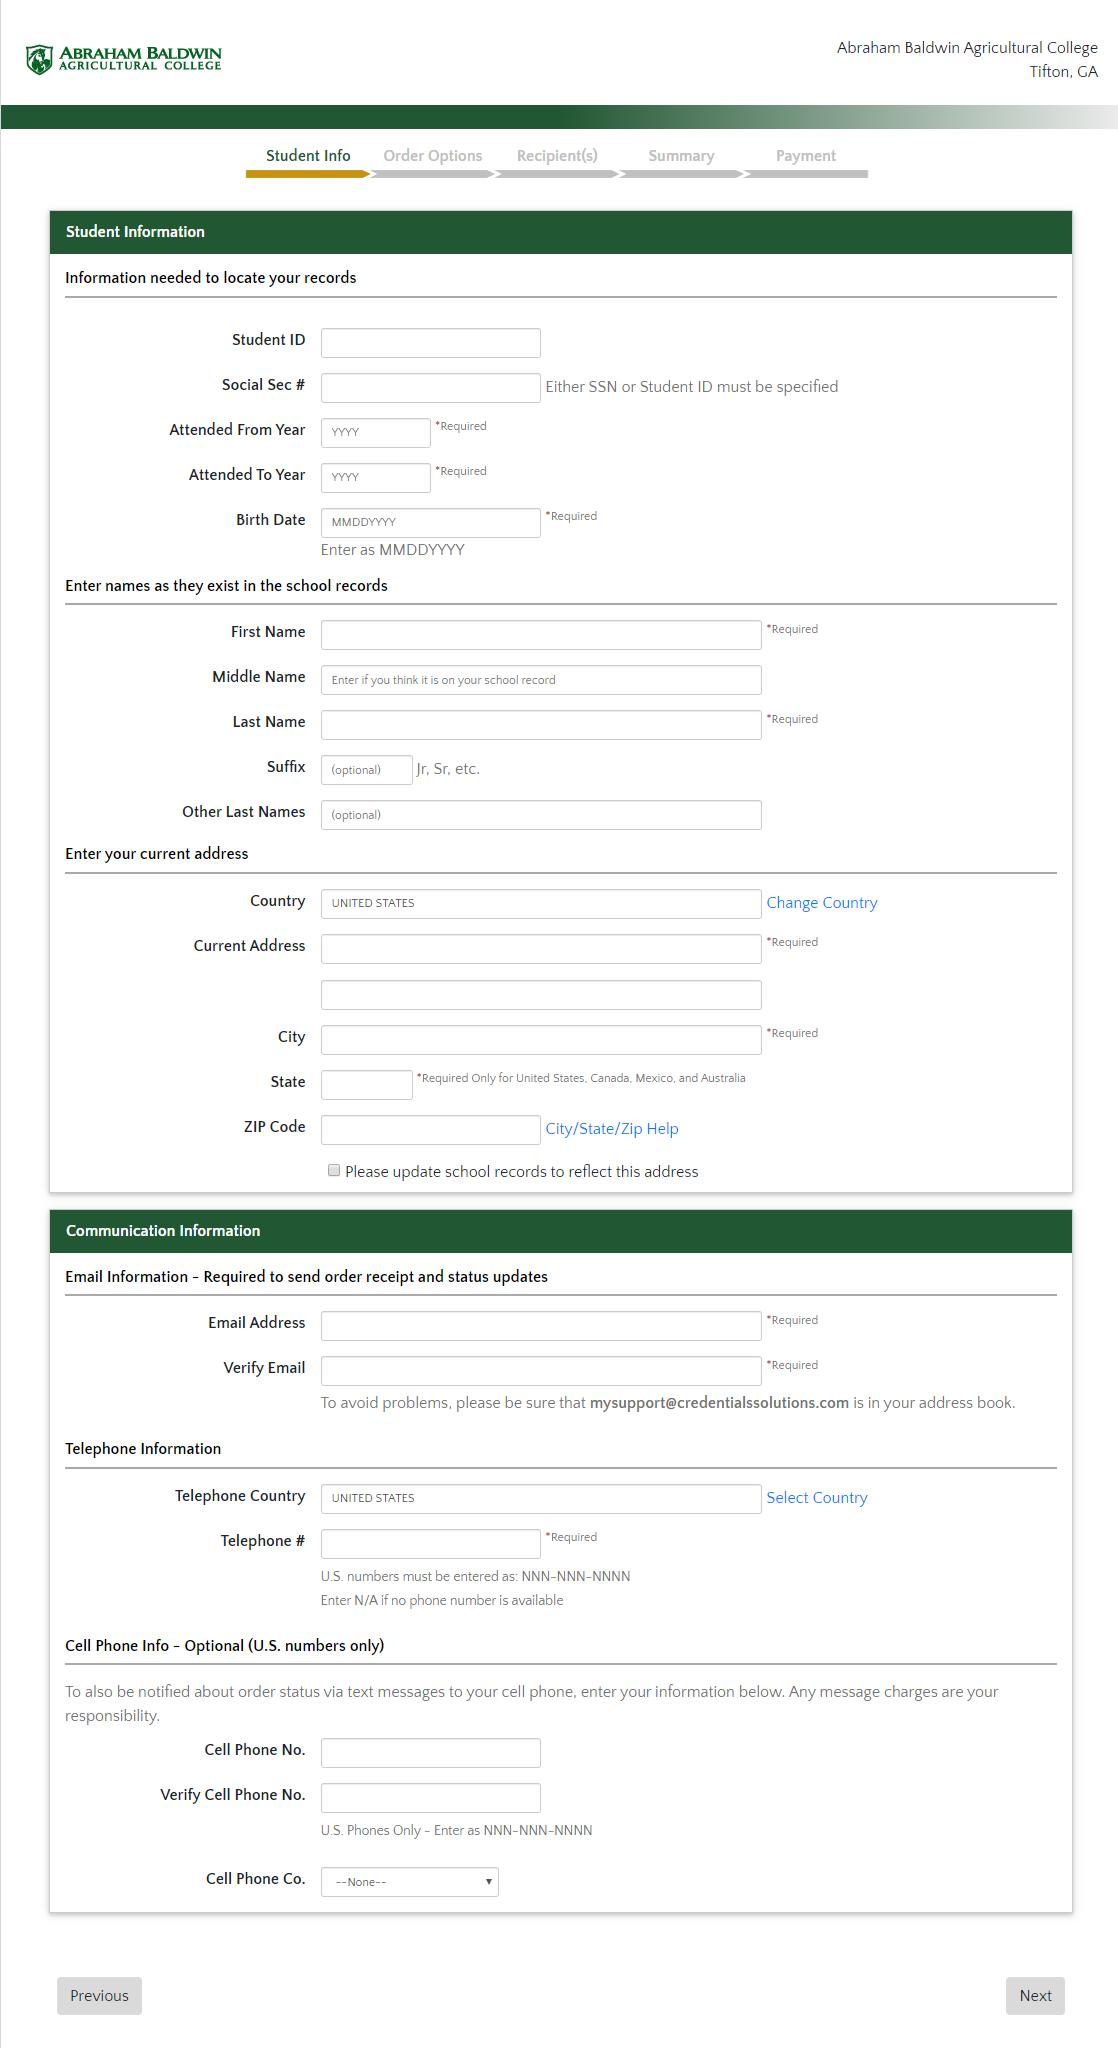 order a transcript from Credentials SolutioTranscript Order Student Informationns online